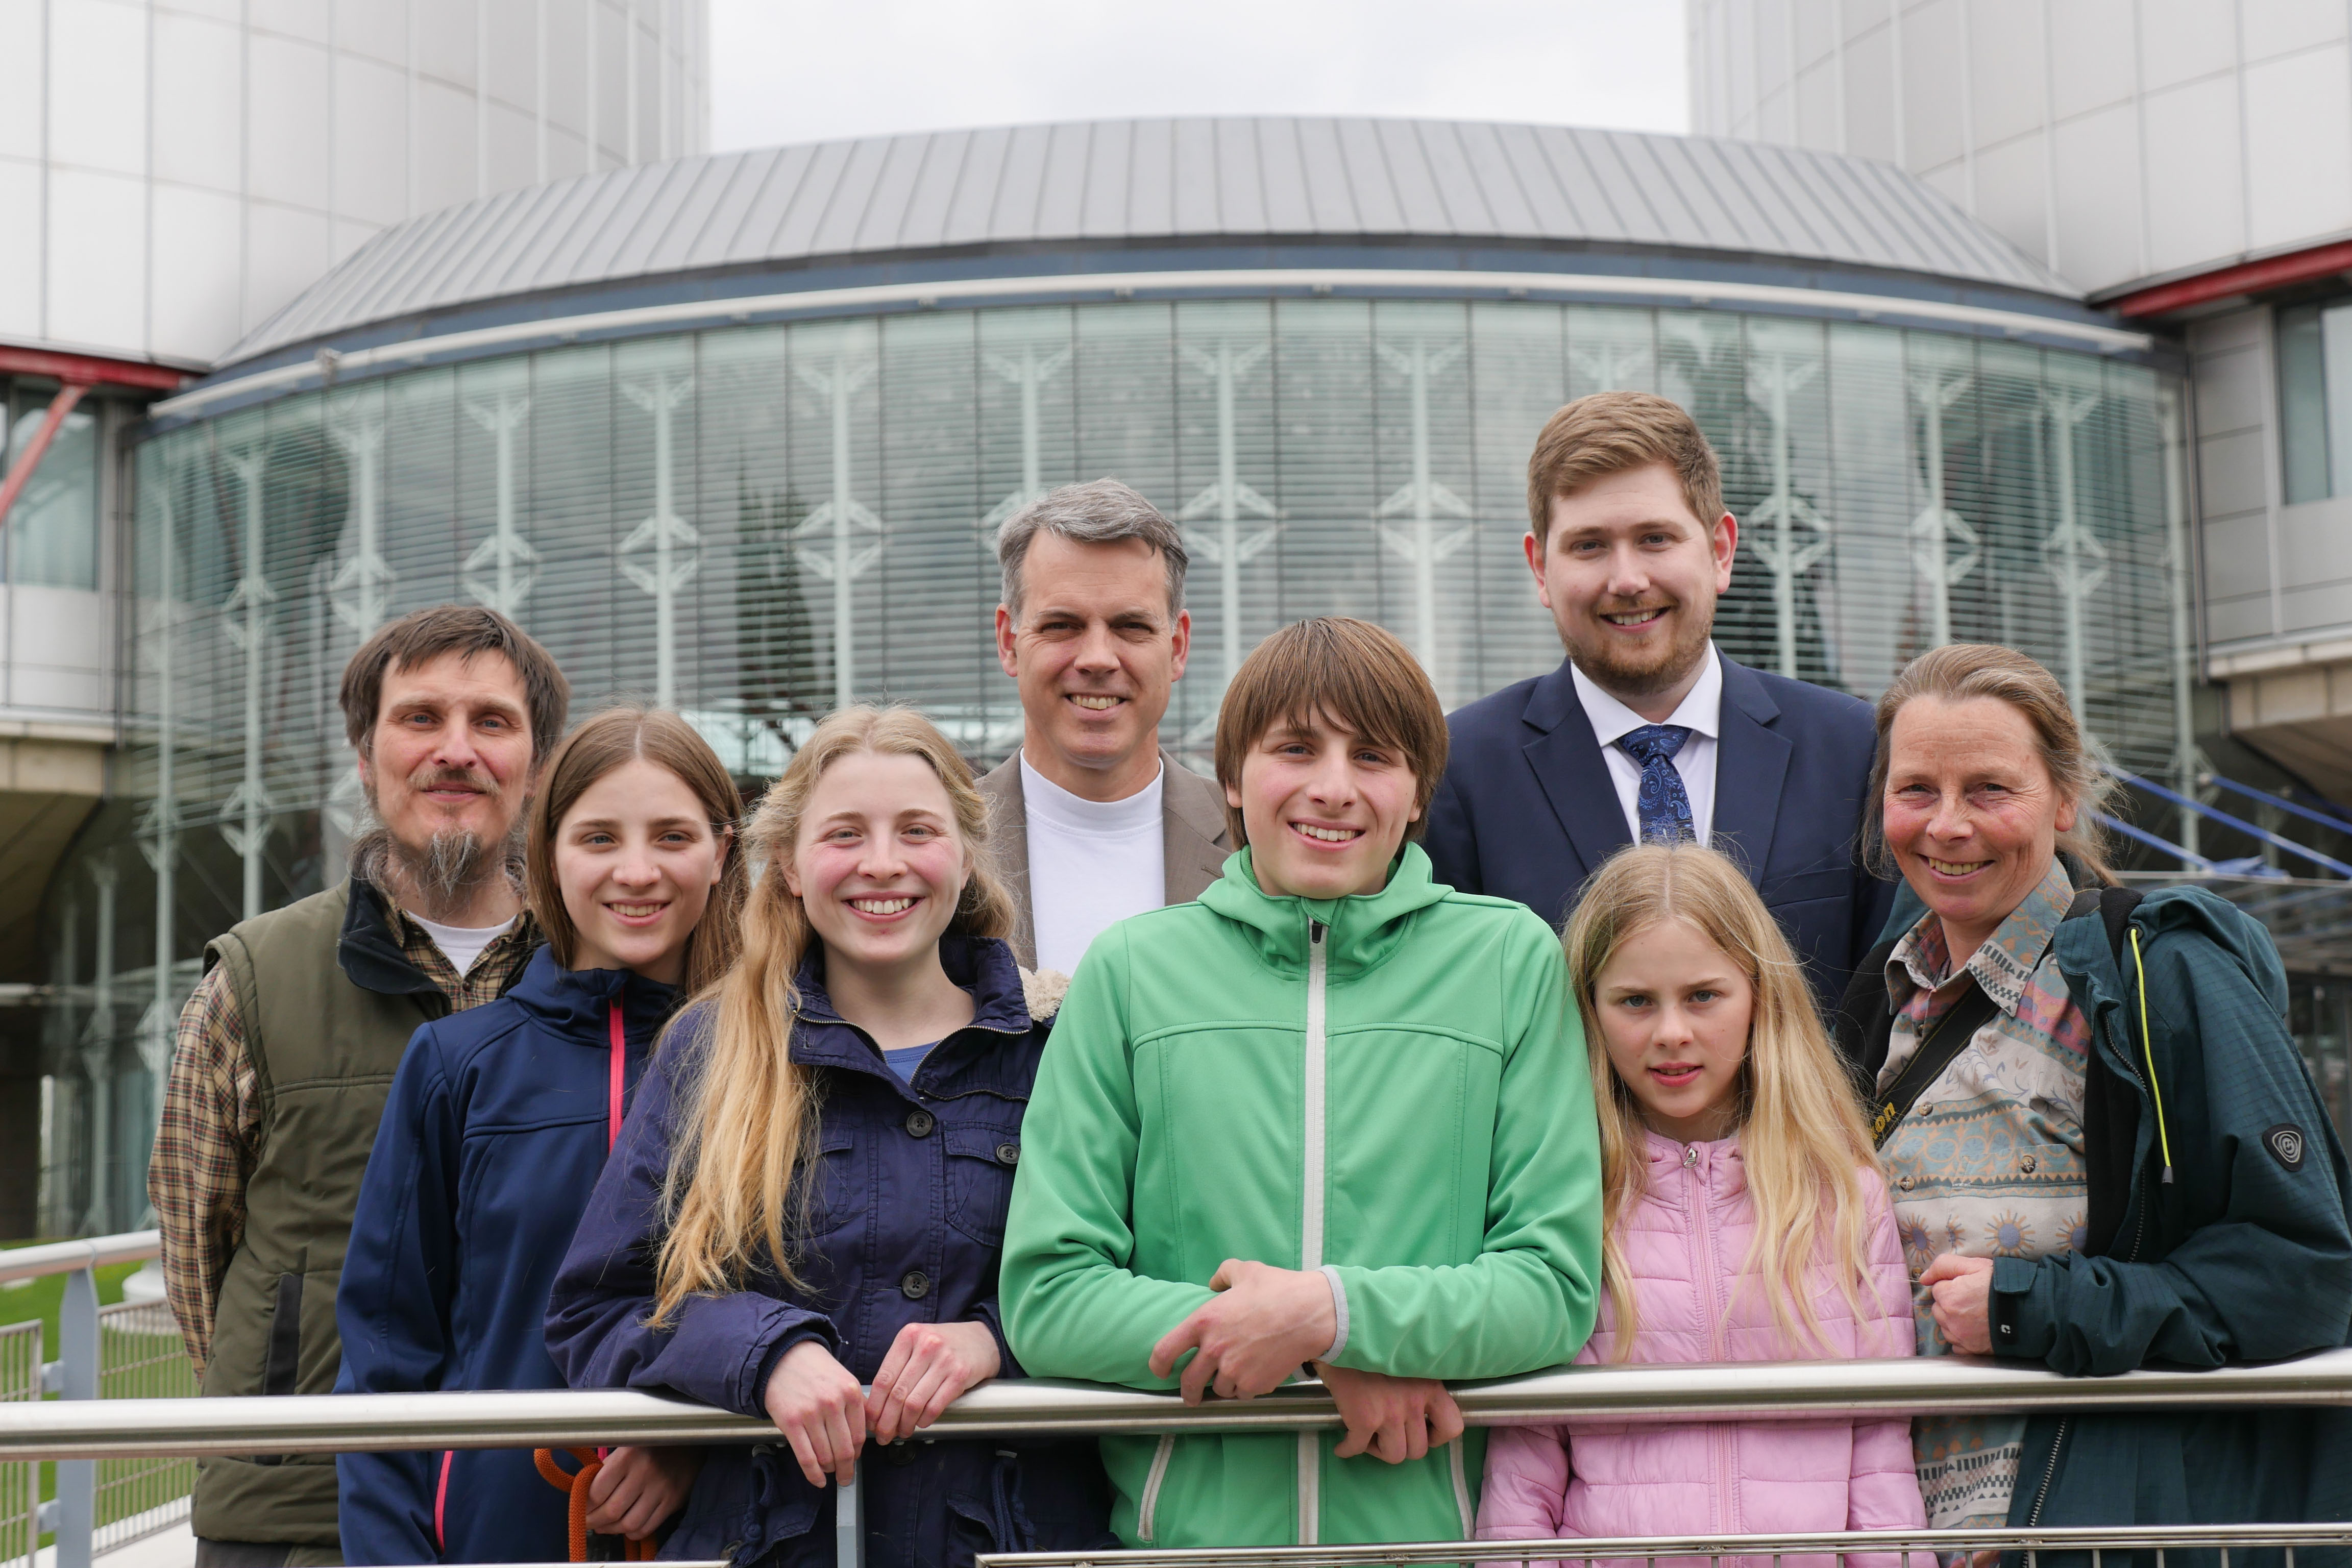 Wunderlich Family